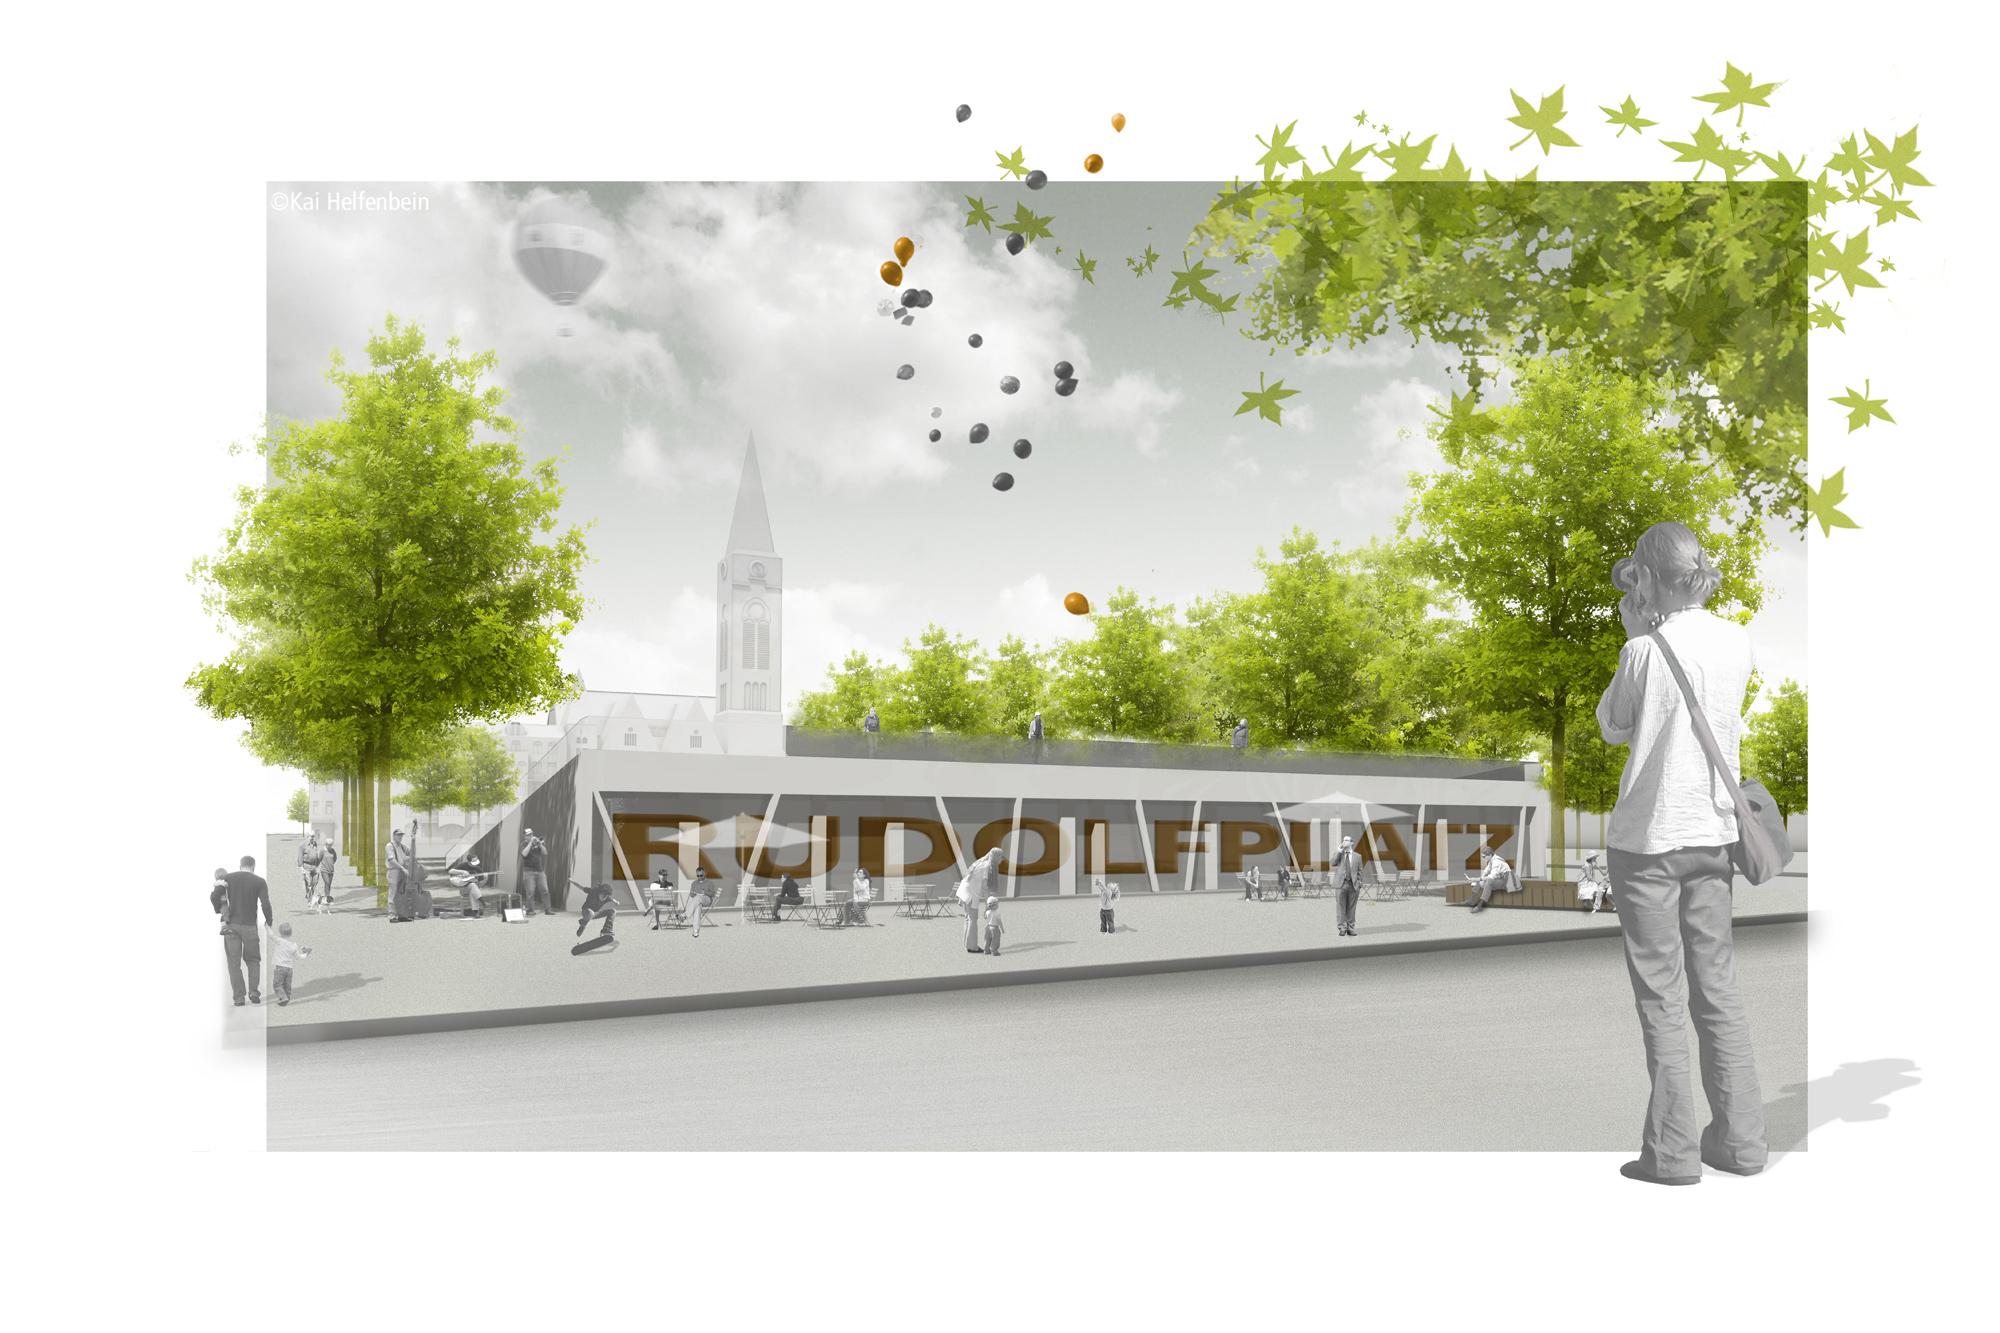 Landschaftsarchitektur Garten Skizze: Emejing ...